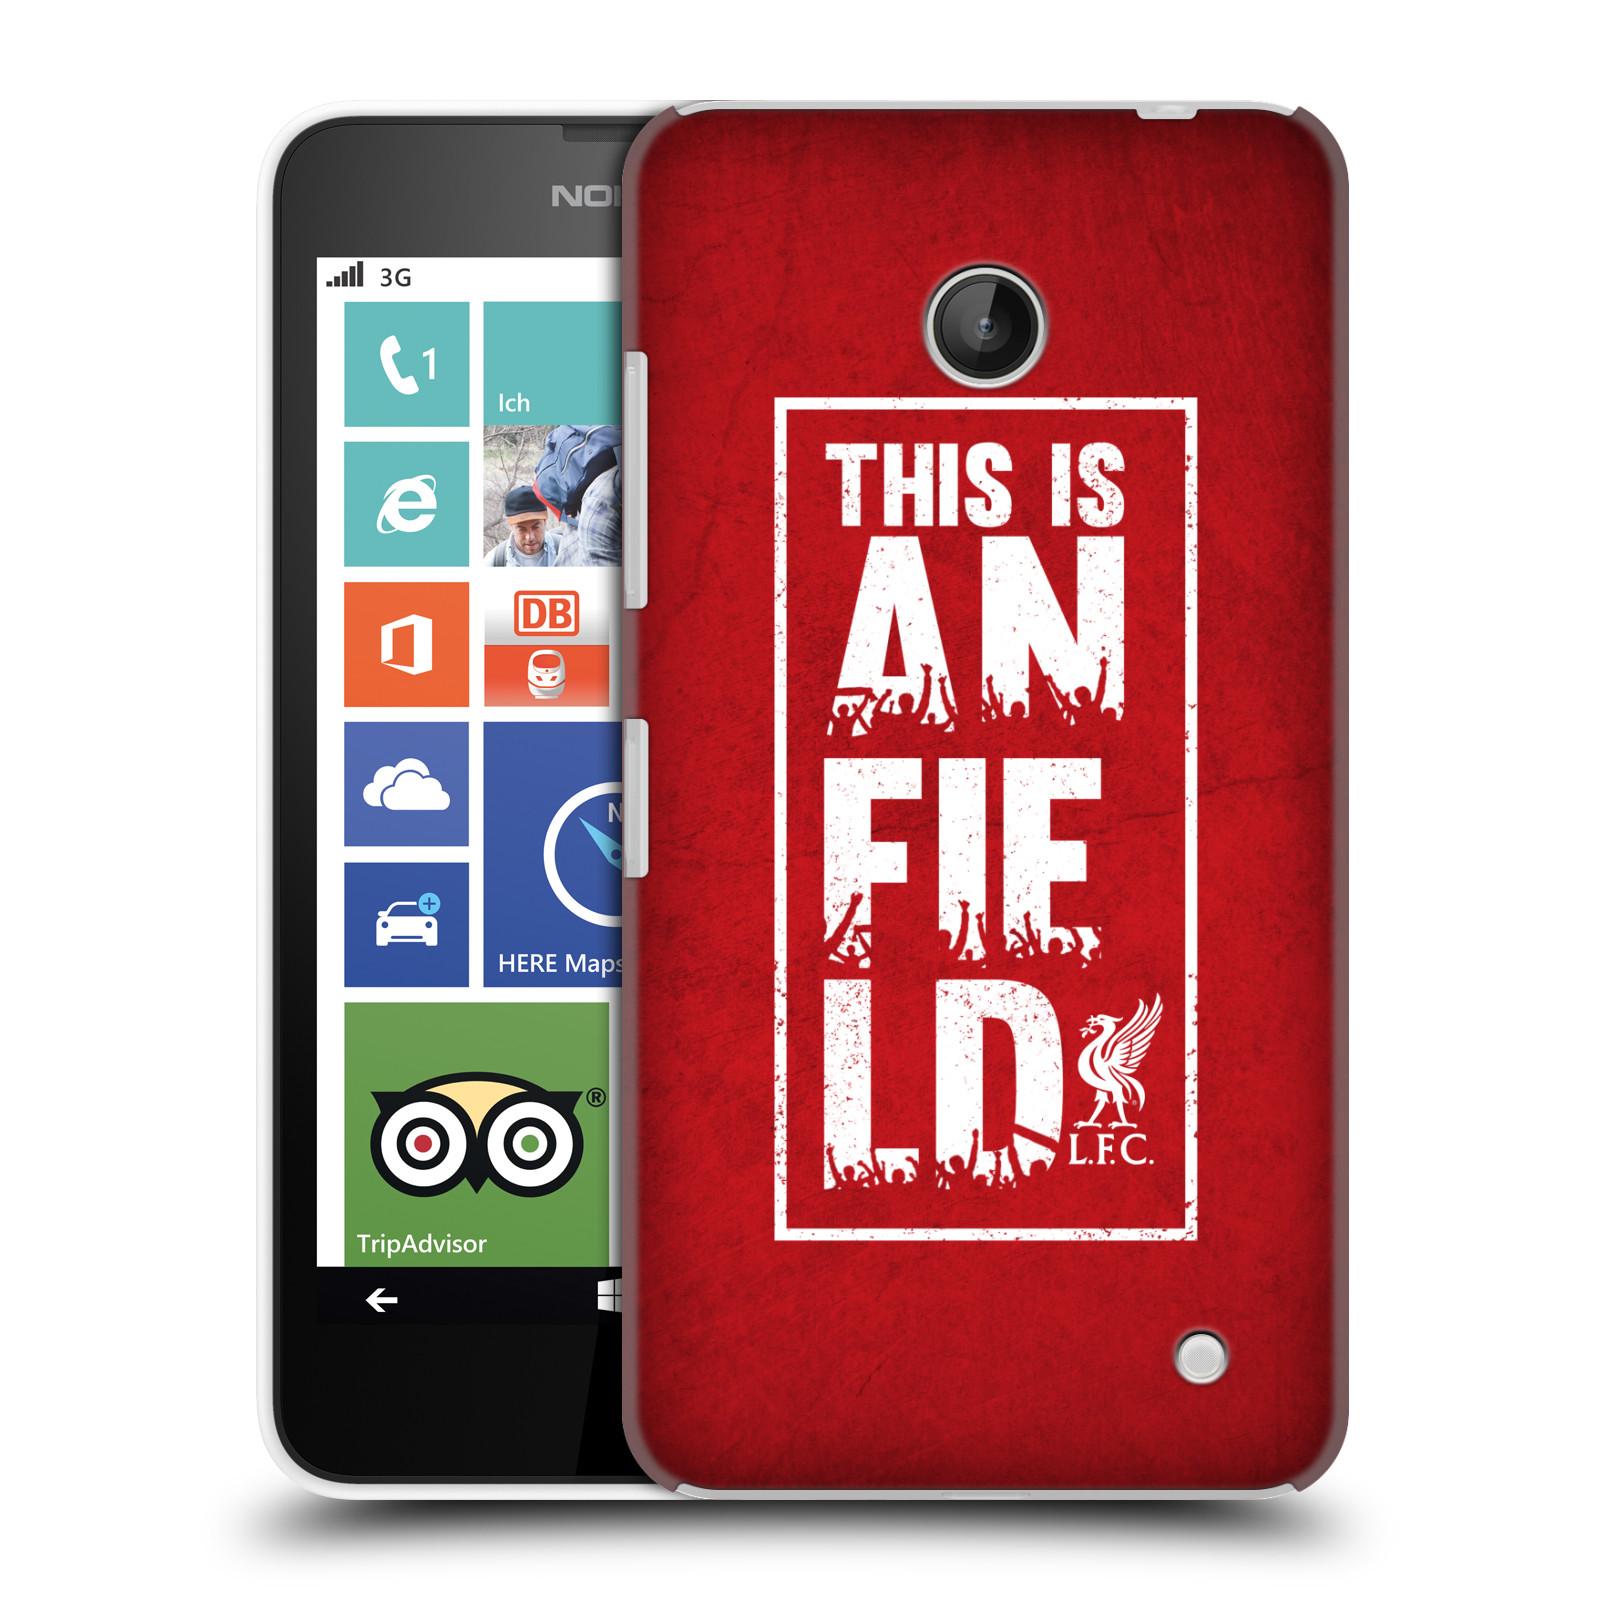 Plastové pouzdro na mobil Nokia Lumia 630 HEAD CASE Liverpool FC This Is Anfield Red (Kryt či obal na mobilní telefon Liverpool FC Official pro Nokia Lumia 630 a Nokia Lumia 630 Dual SIM)